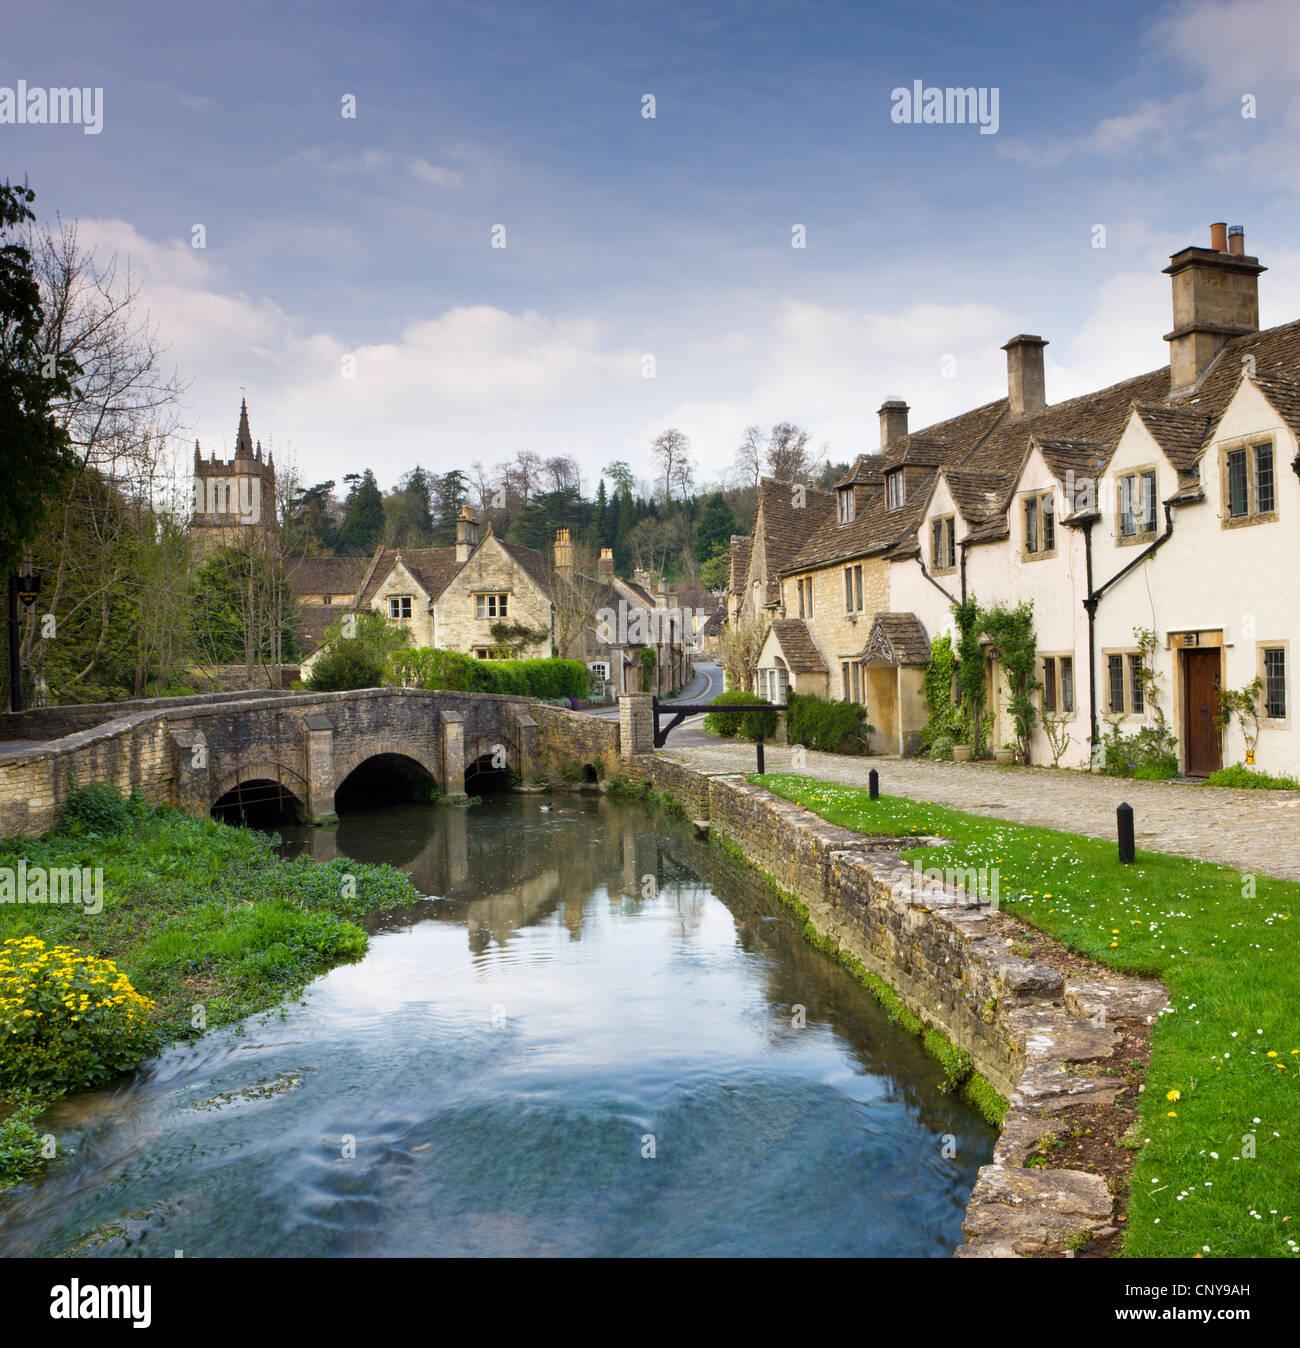 Malerischen Cotswolds Dorf von Castle Combe, Wiltshire, England. Frühling (April) 2009 Stockbild